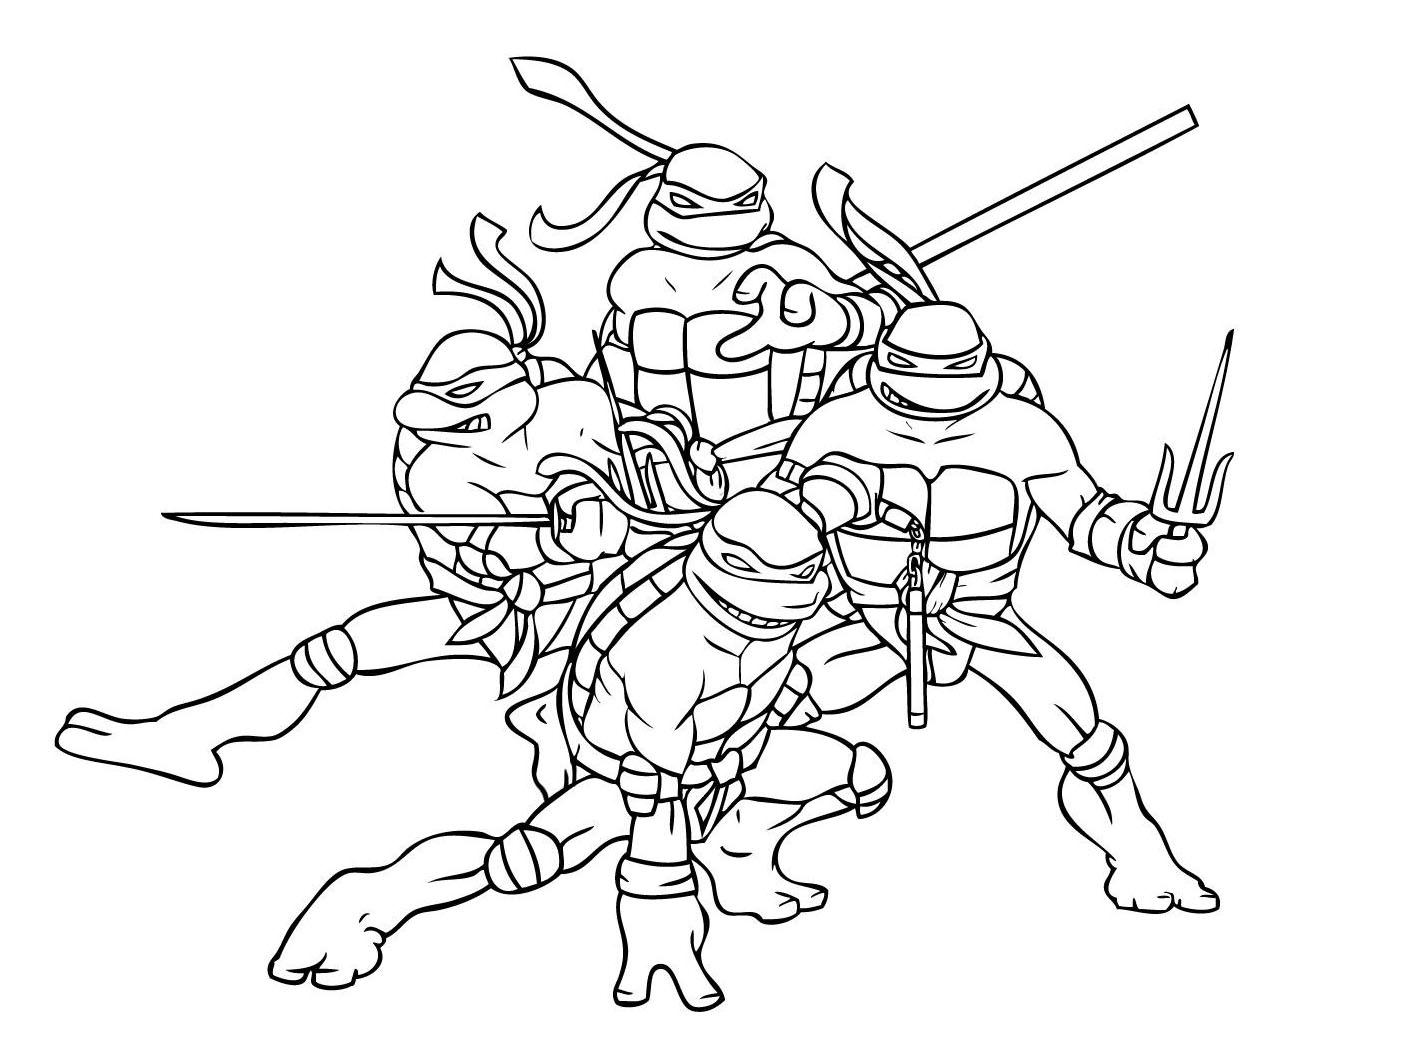 Free Ninja Turtles coloring page to download